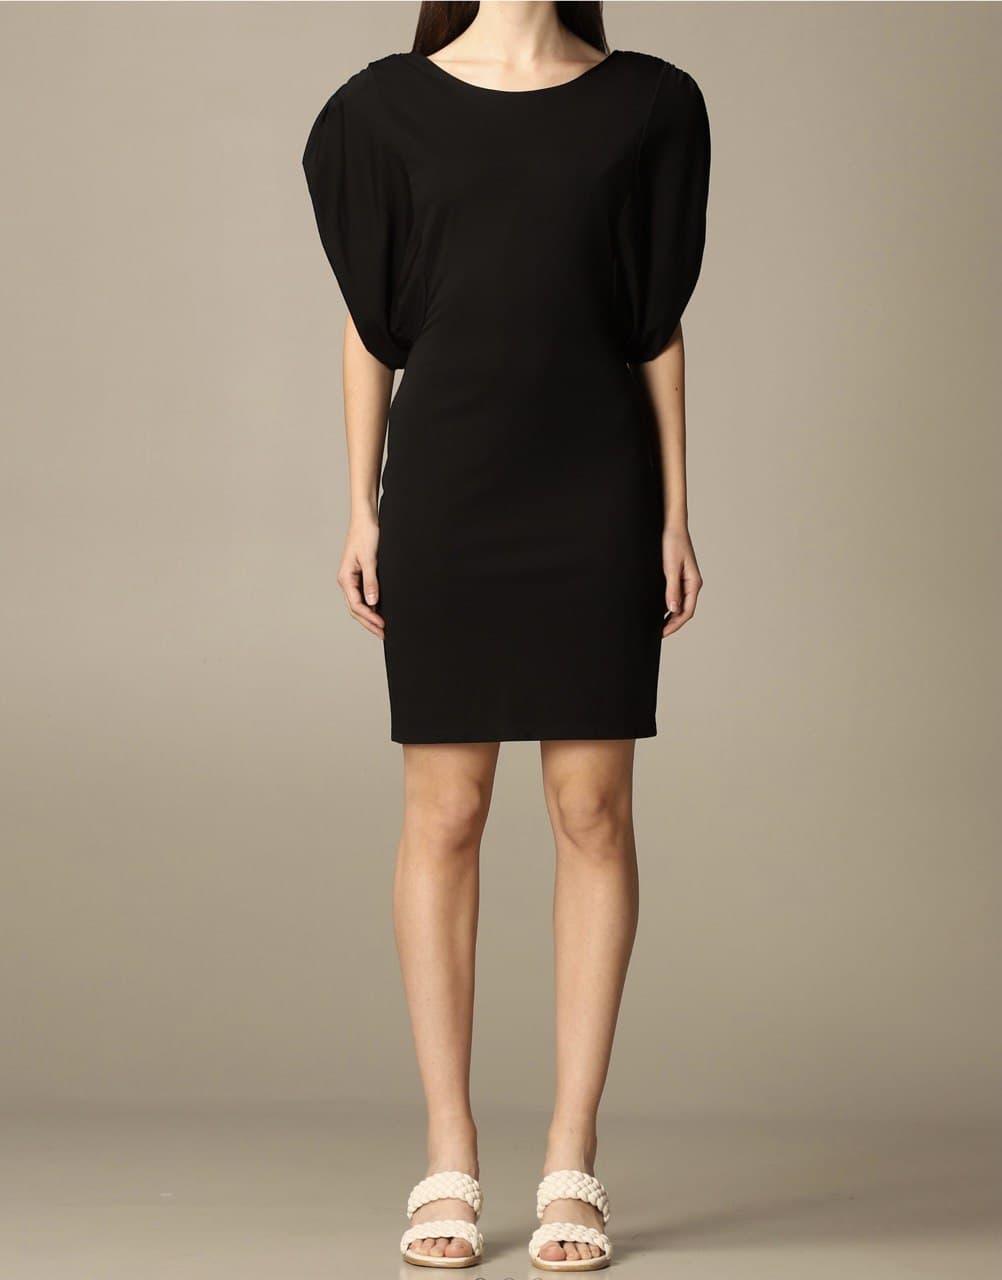 TWIN SET ACTITUDE | Dress | 21MT261000006